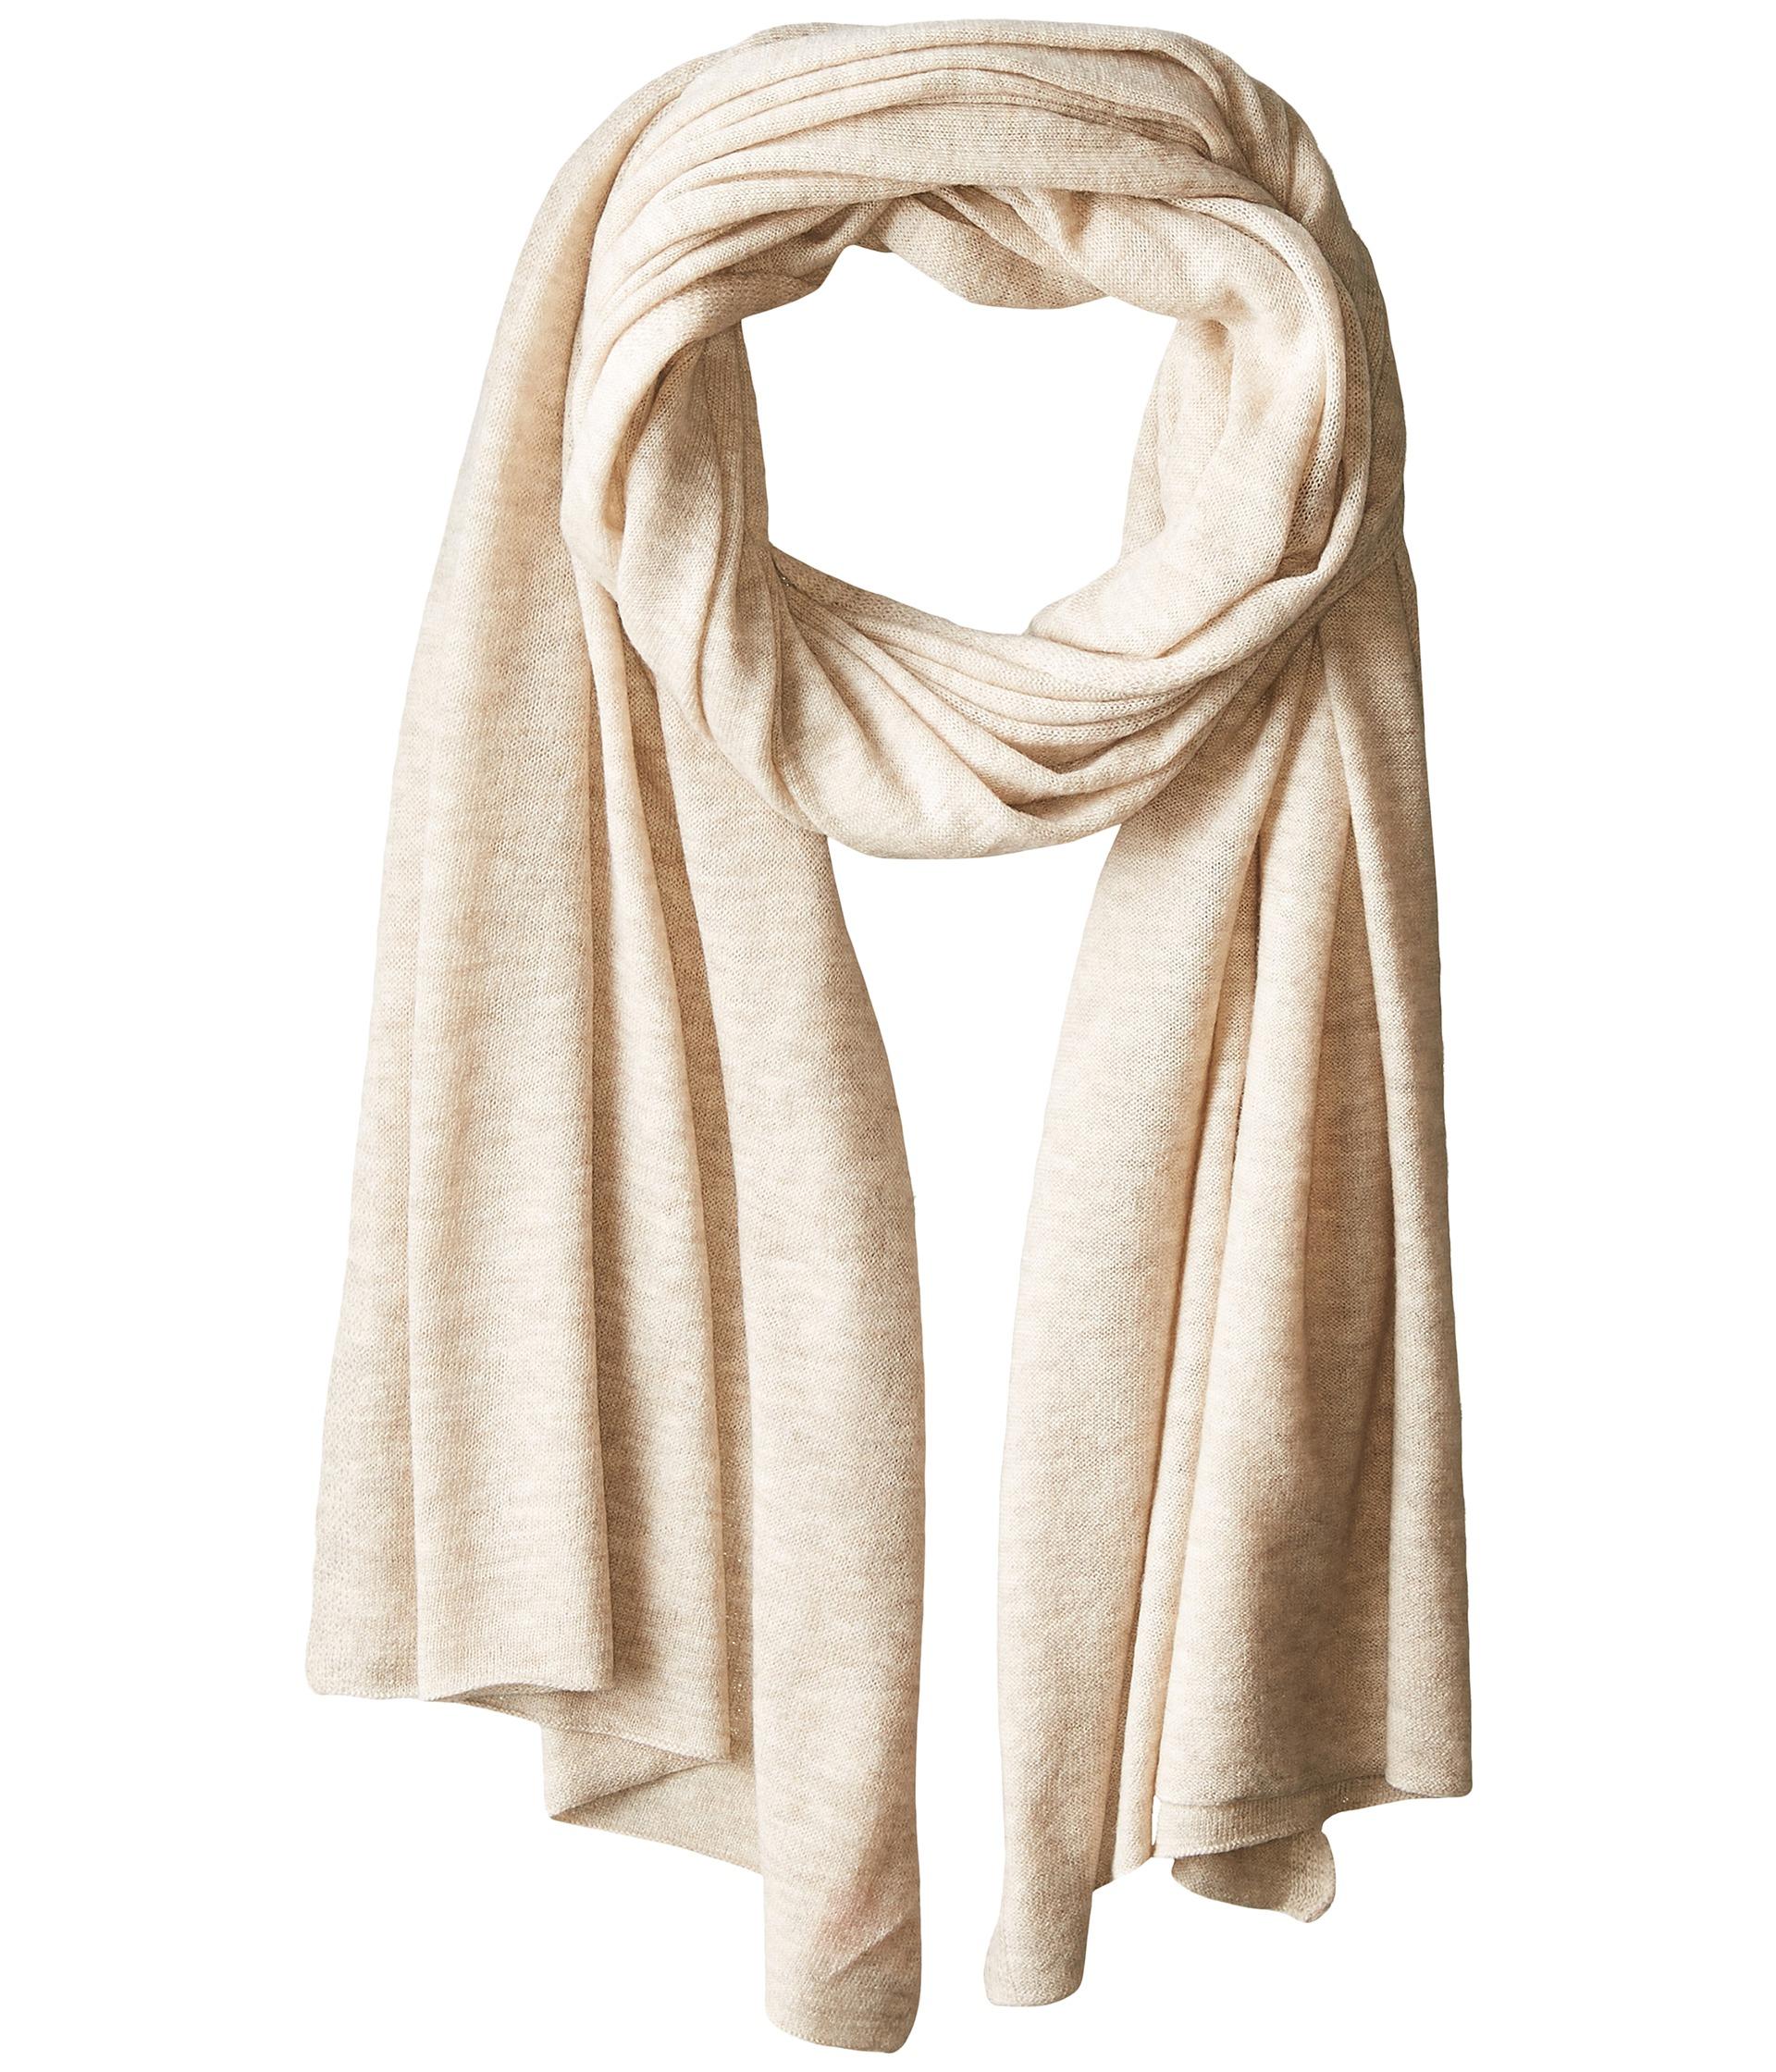 pistil nectar scarf at zappos